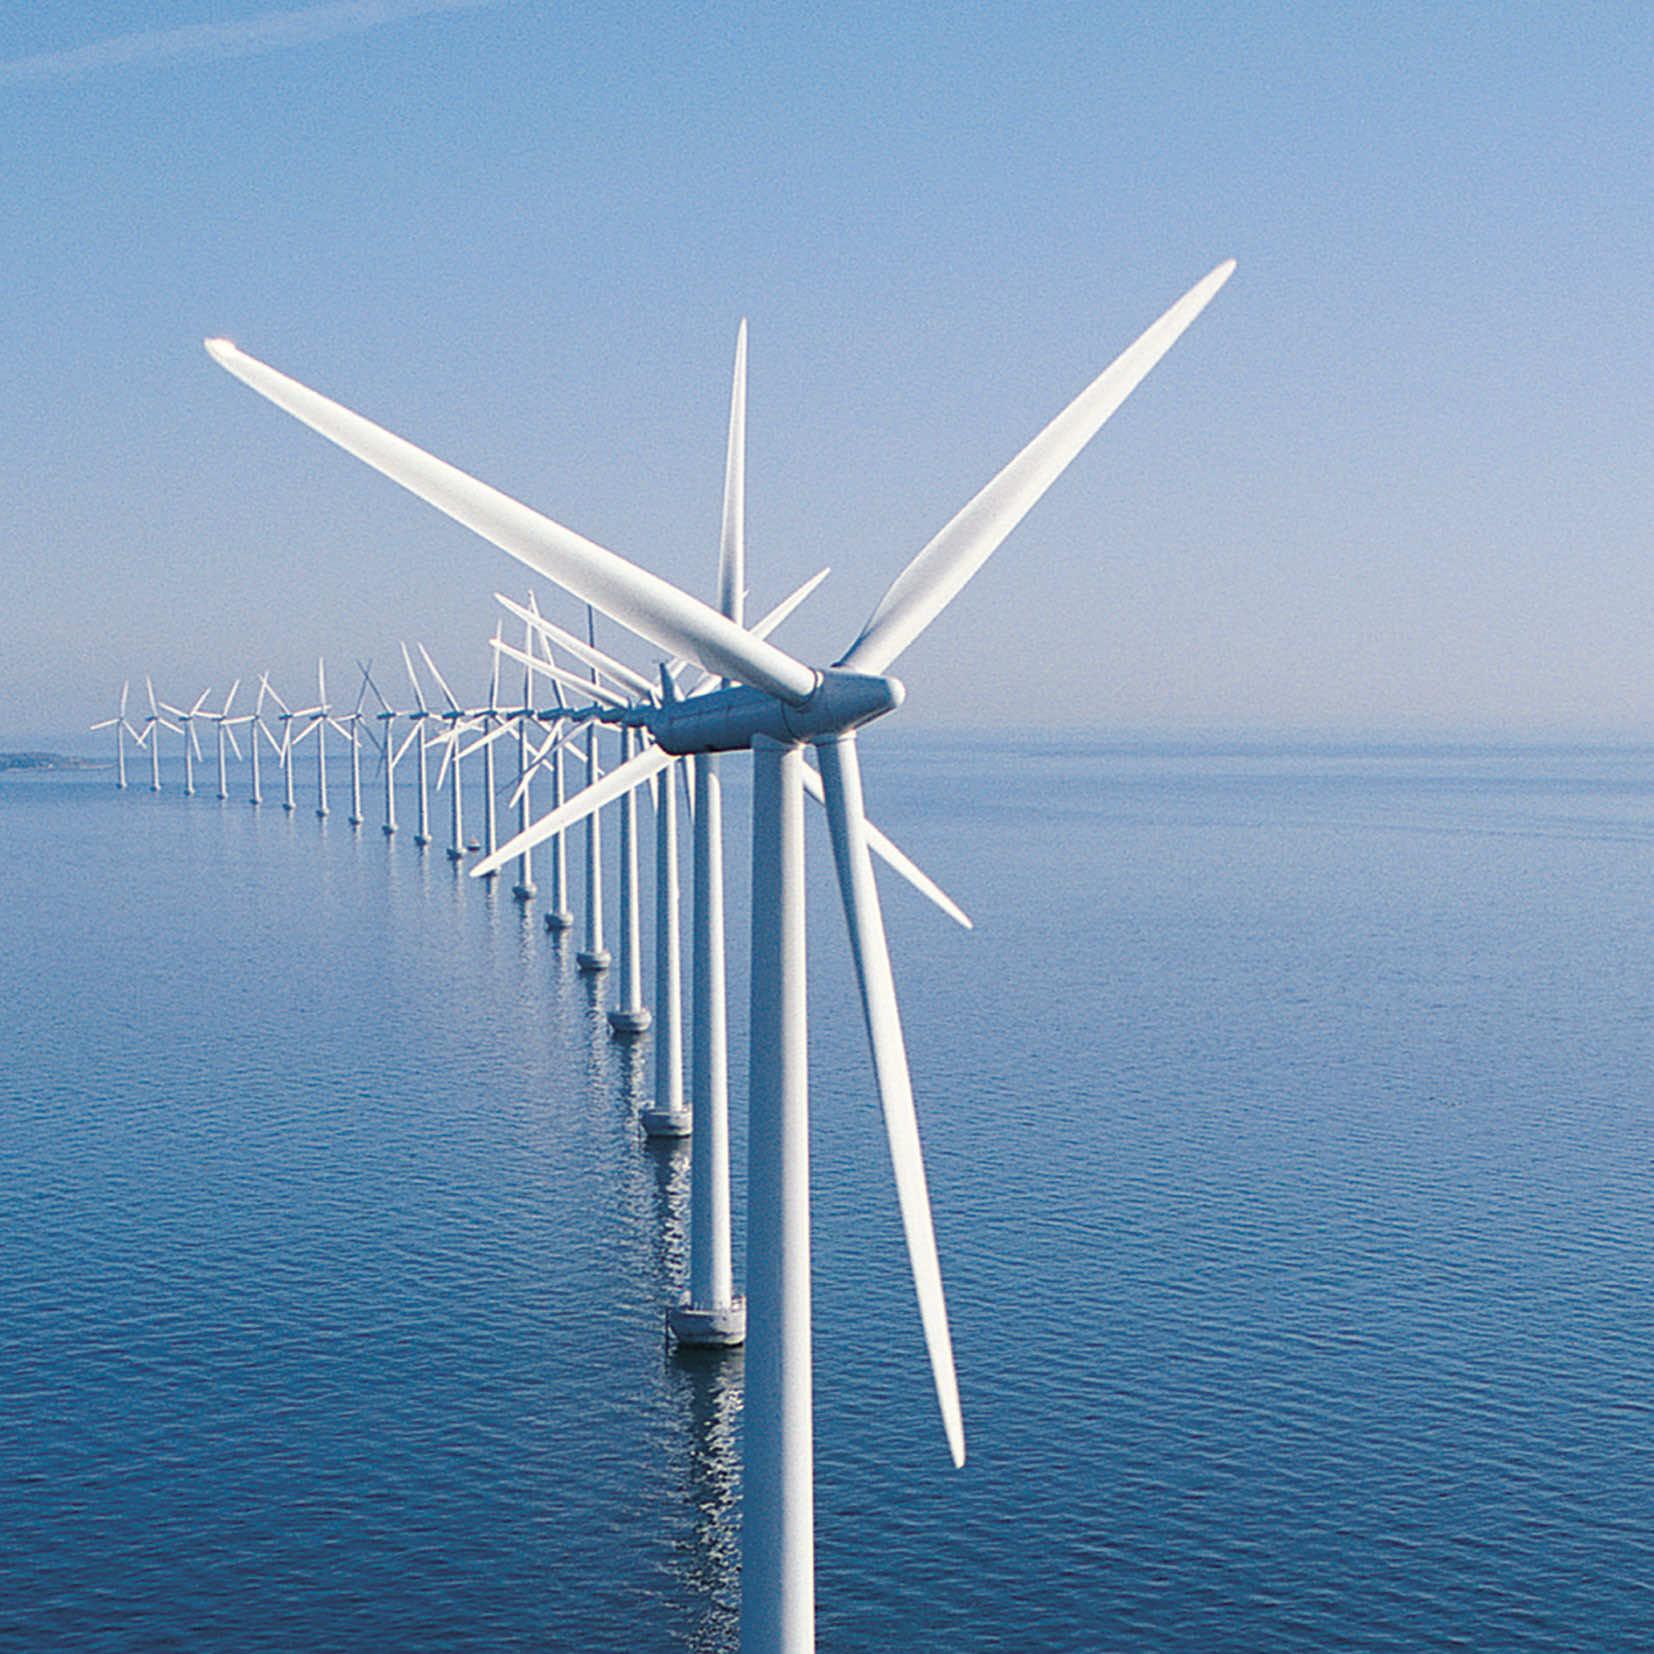 wind turbine pictures 2